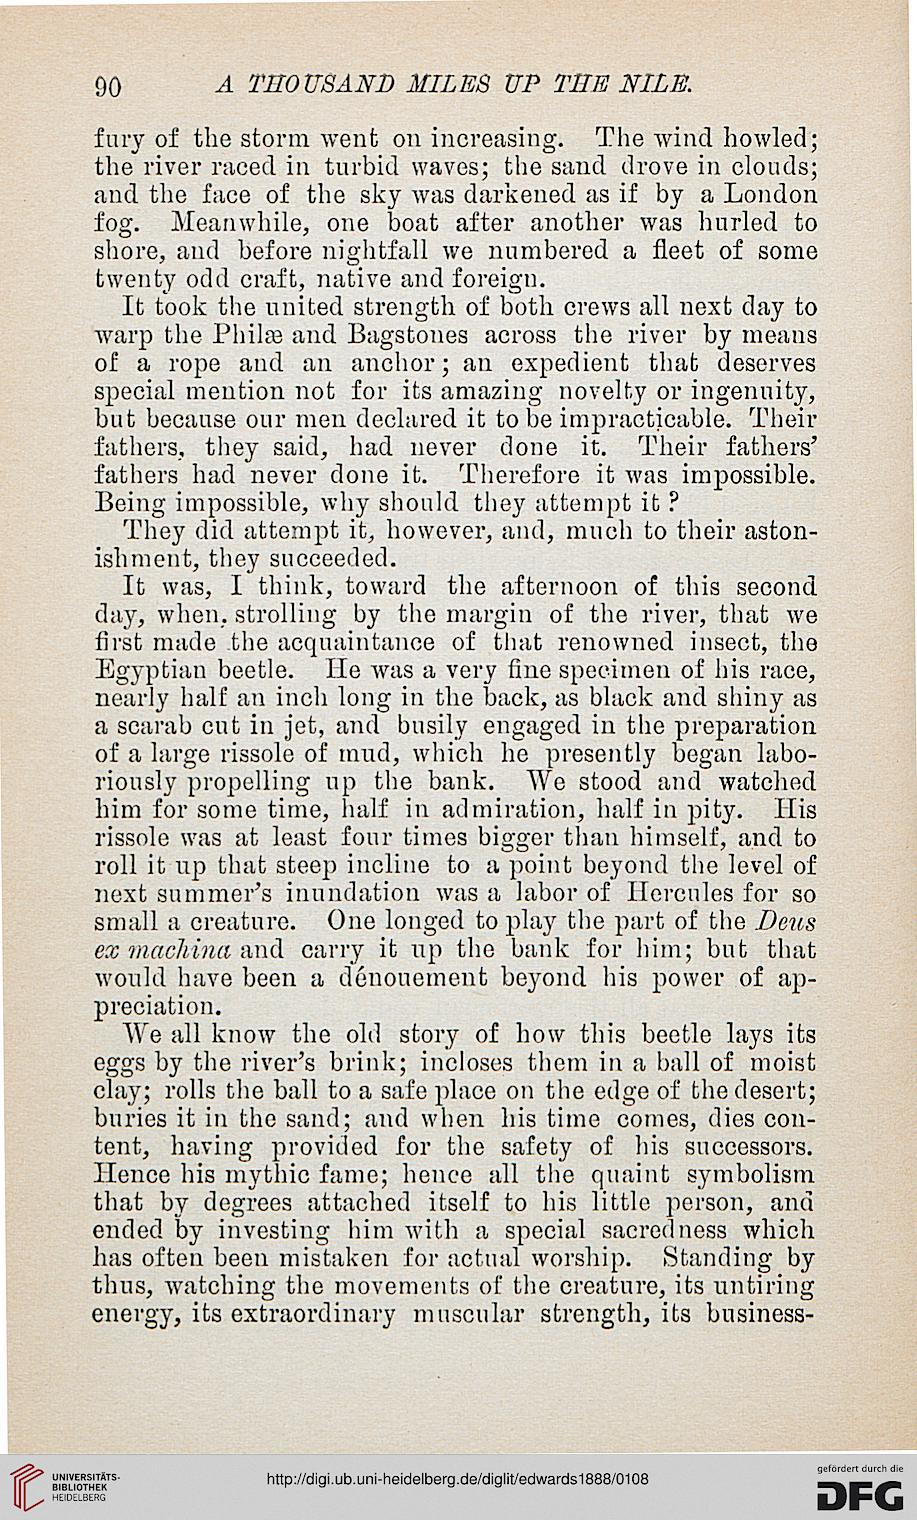 Edwards, Amelia B : A thousand miles up the Nile (New York, [1888])